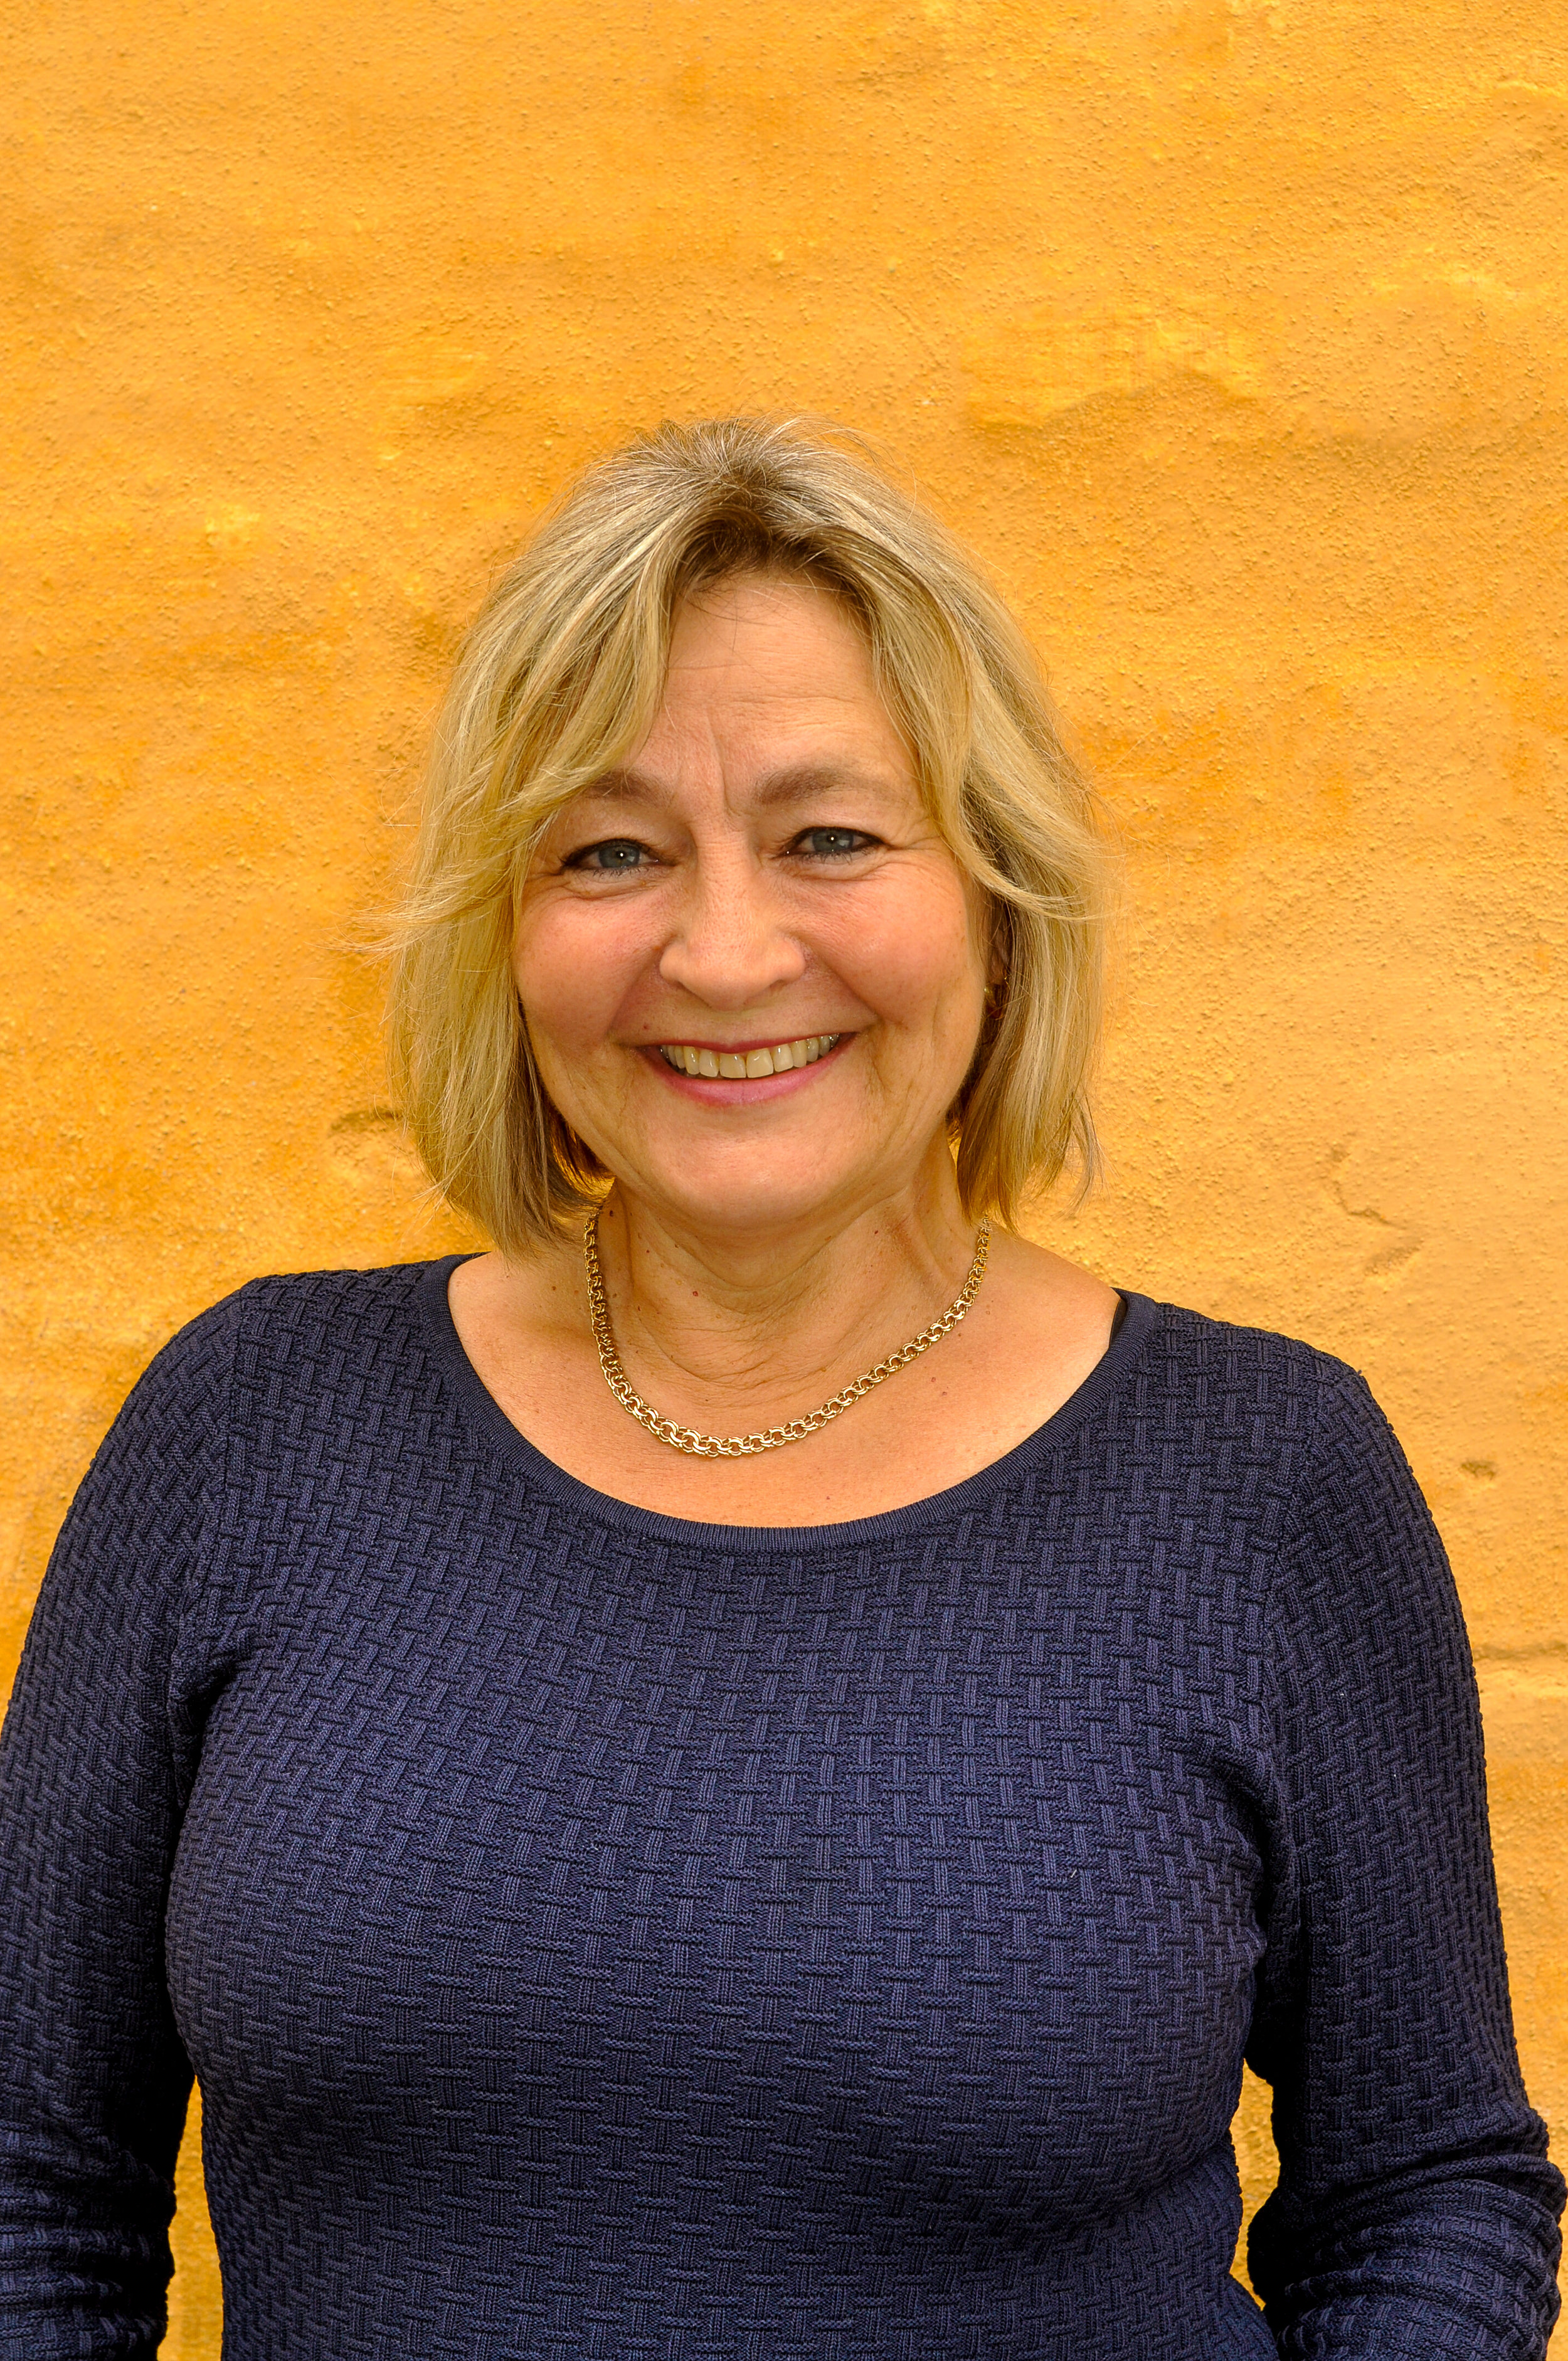 Anne Sidenius